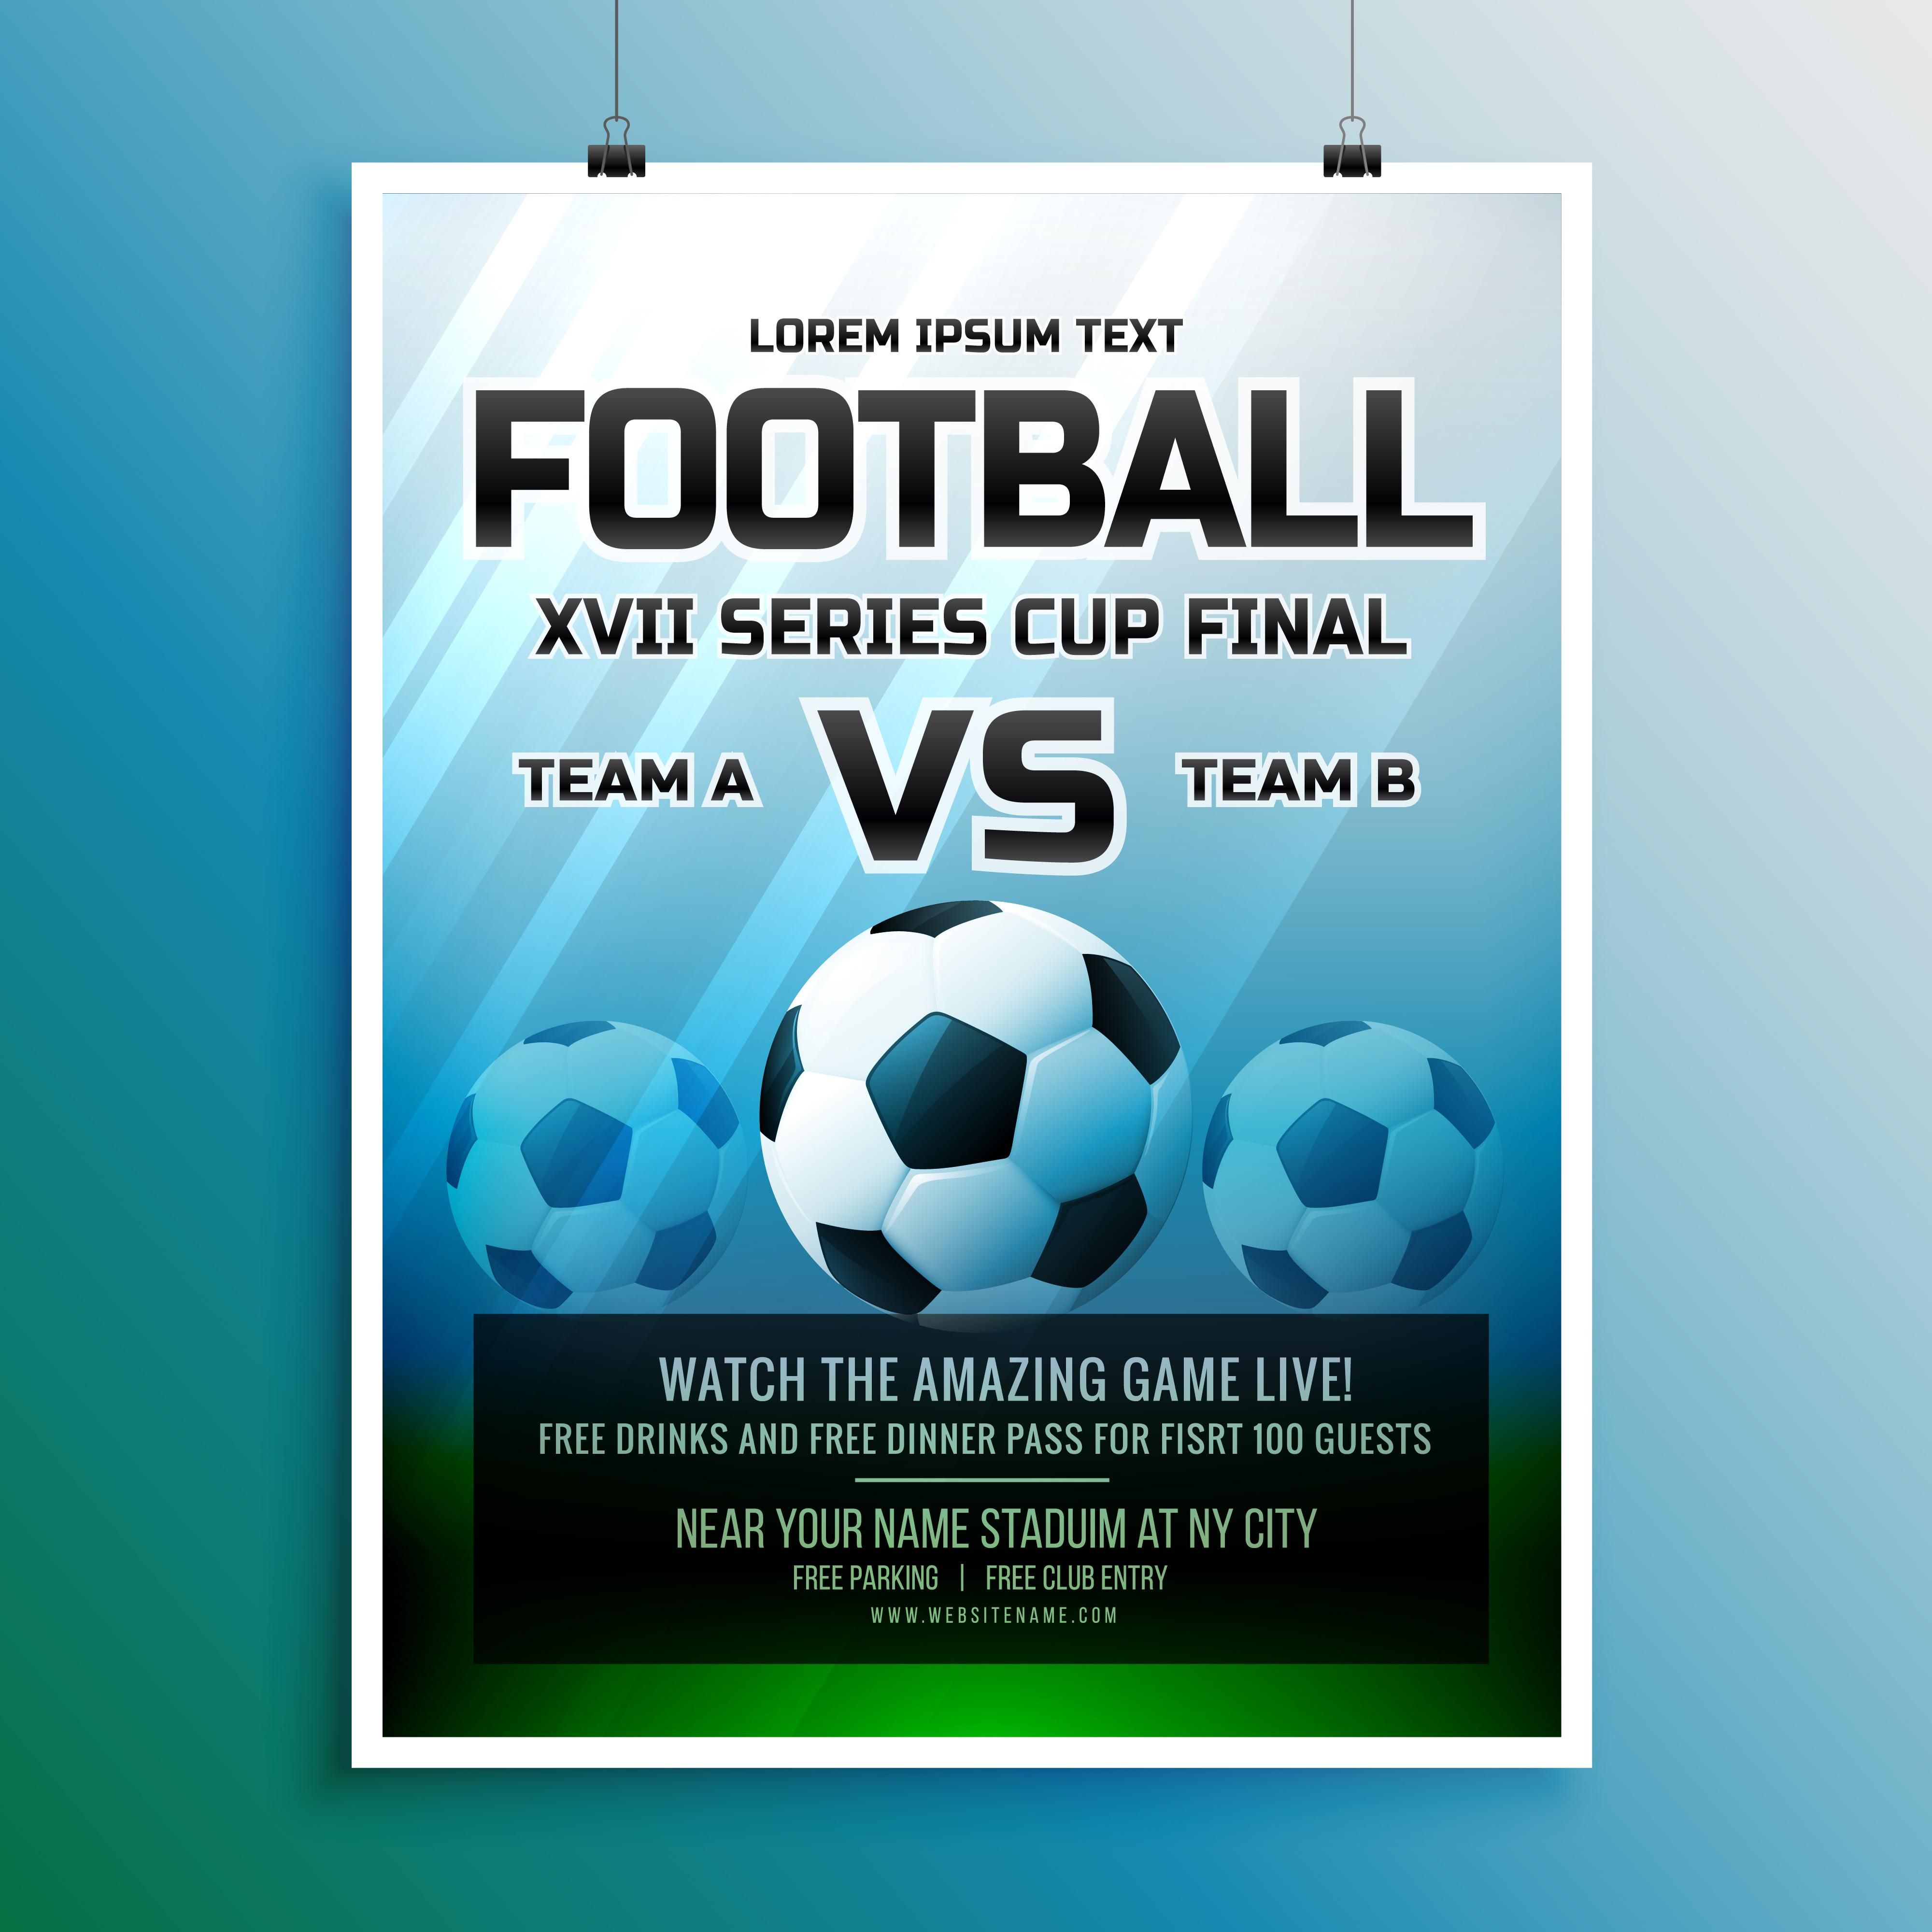 football game event tournament invitation design template